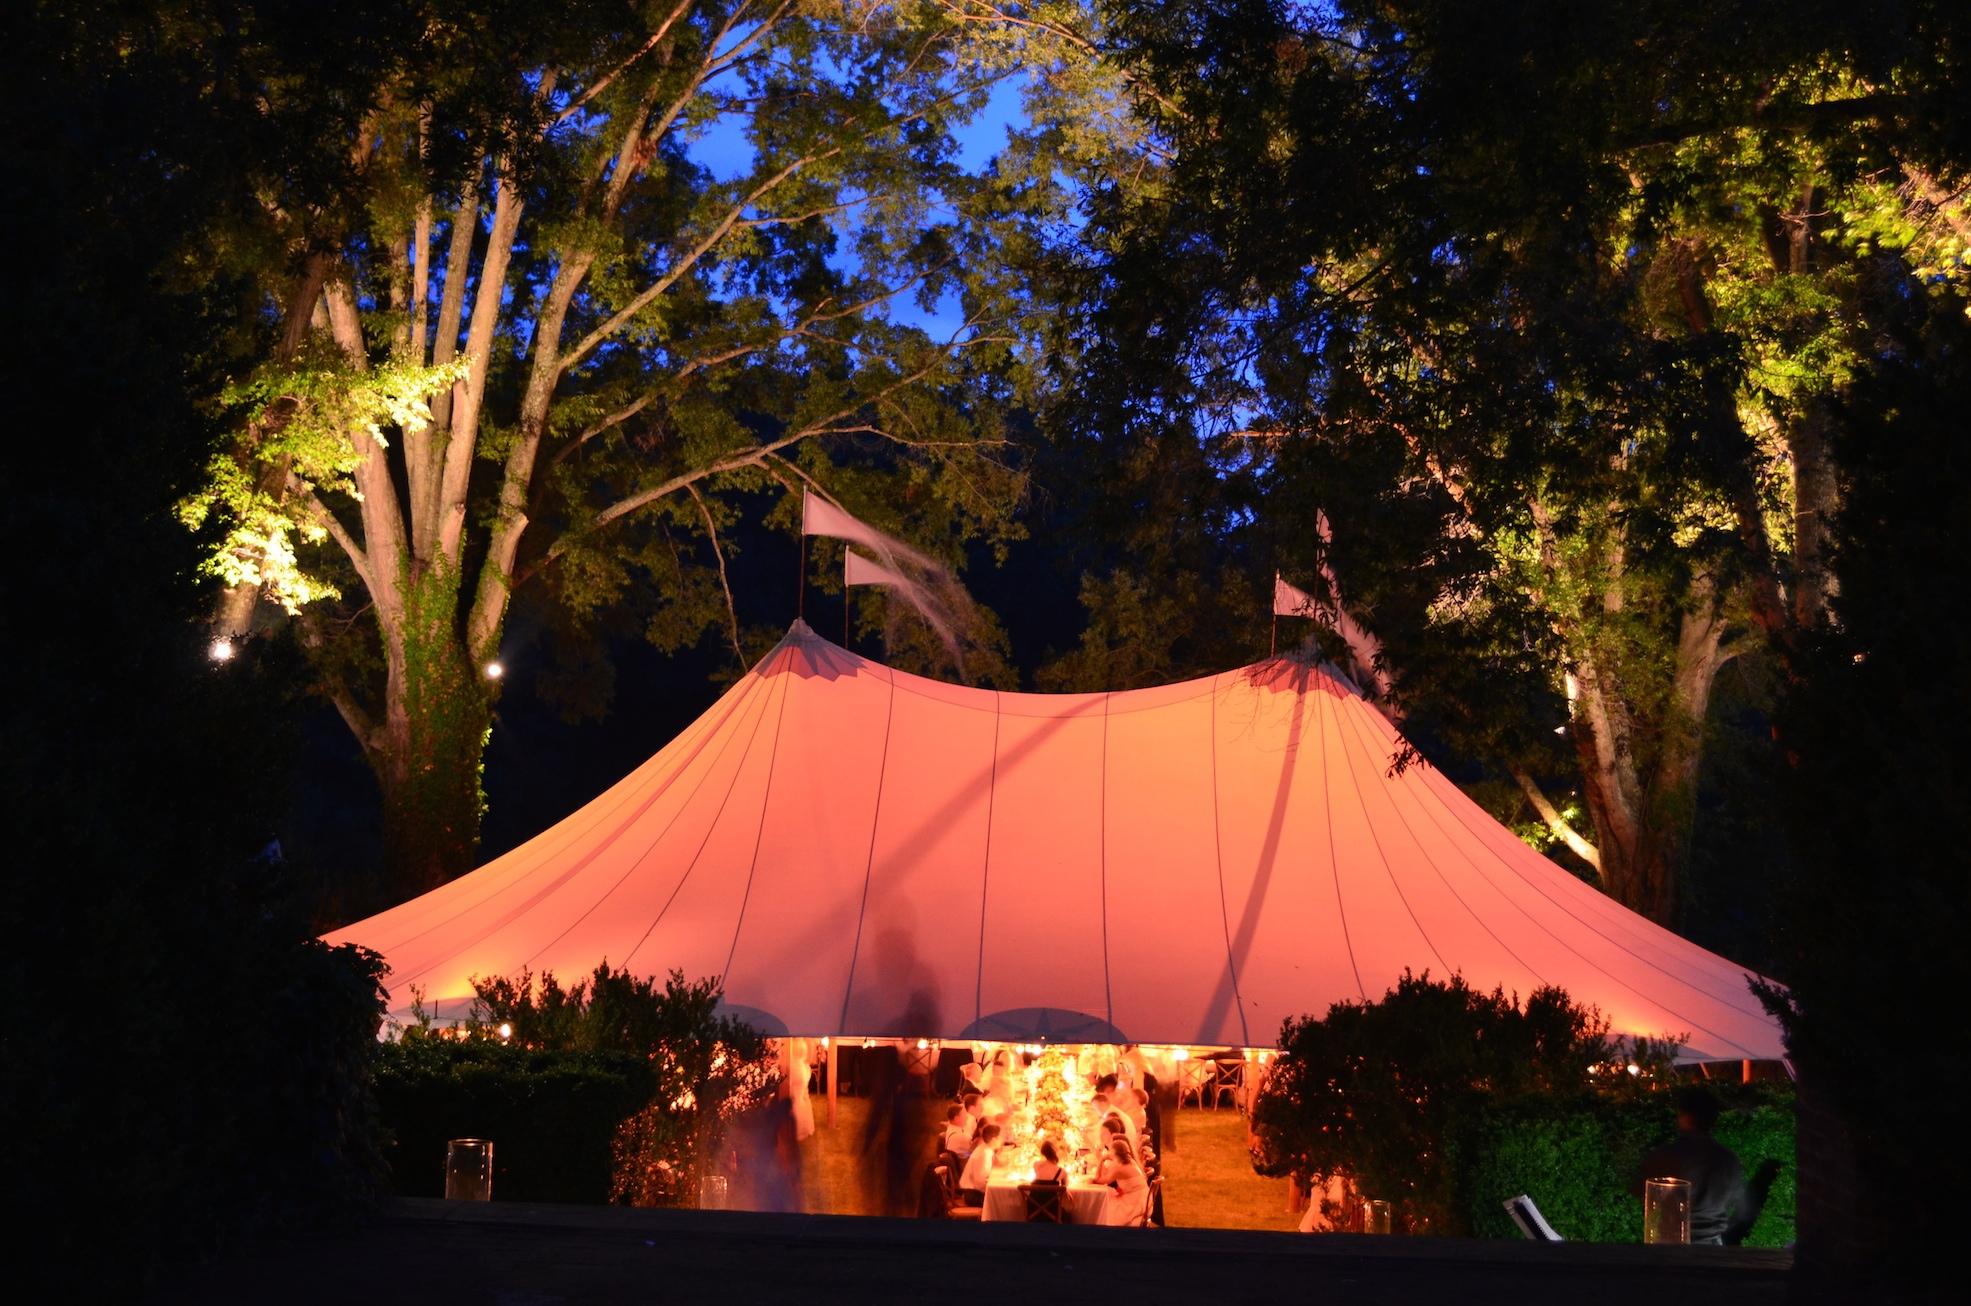 zz Croquette Lawn Tent Night Verulam